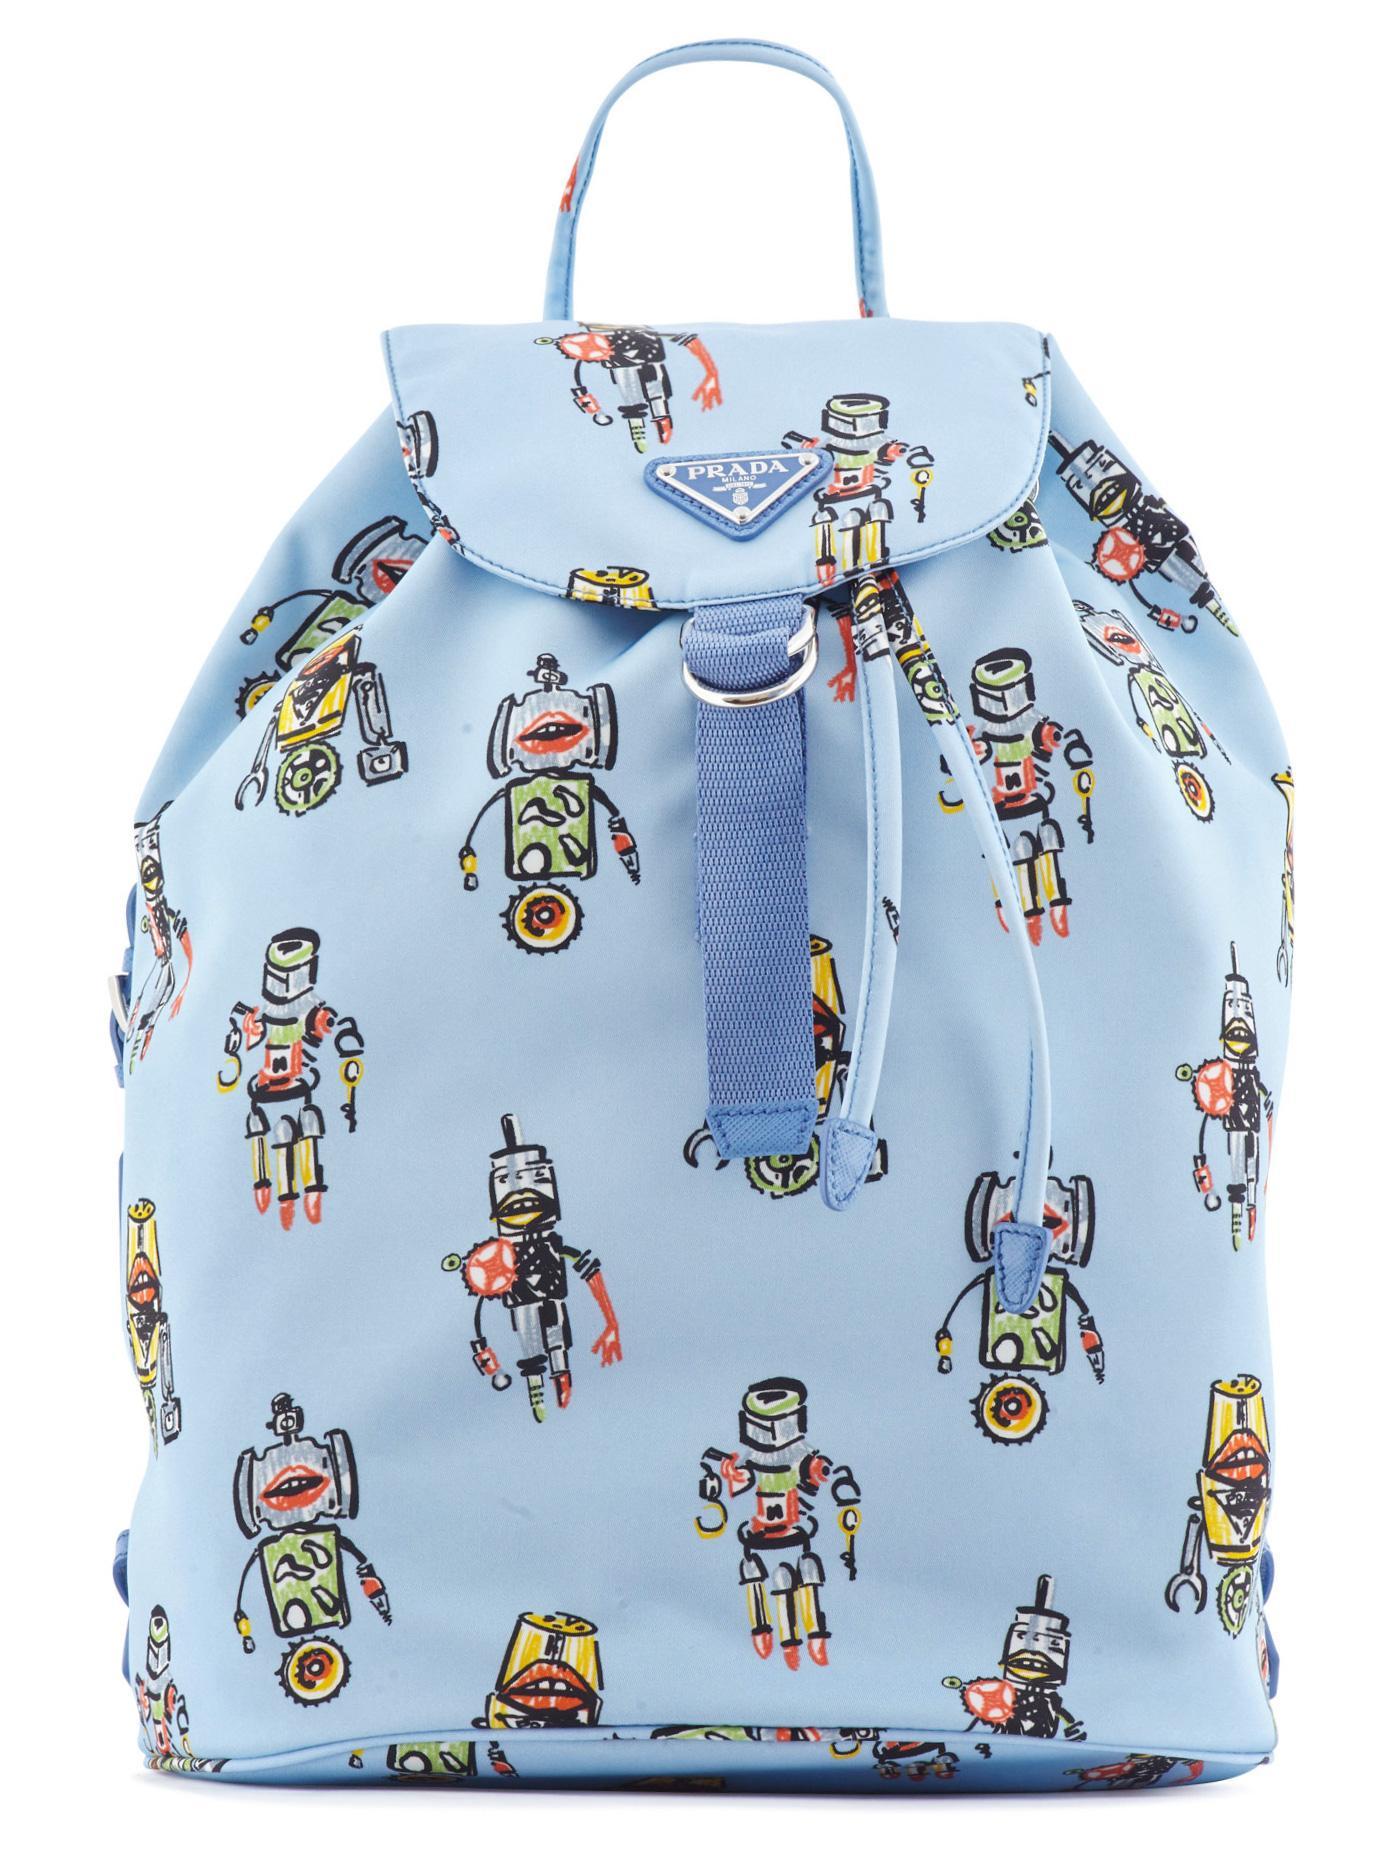 d9b5d4c7c2a5 ... order lyst prada robot print nylon backpack in blue 3ca2b 6e866